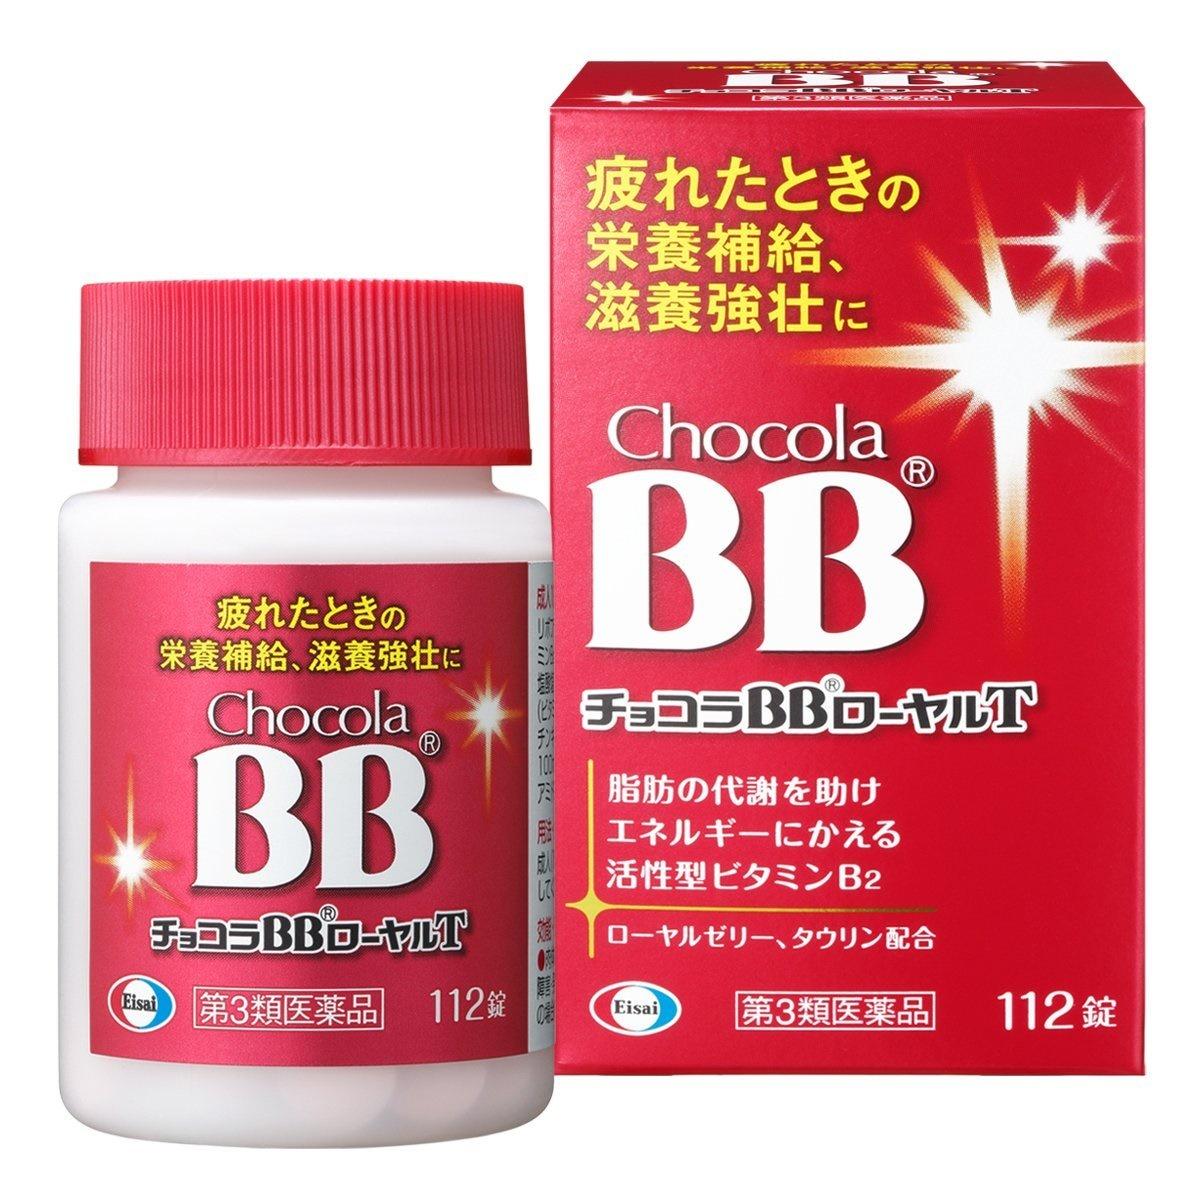 Chocola BB Royal T 56/ 112/ 168 tablets for 14/ 28/ 42 days 俏正美